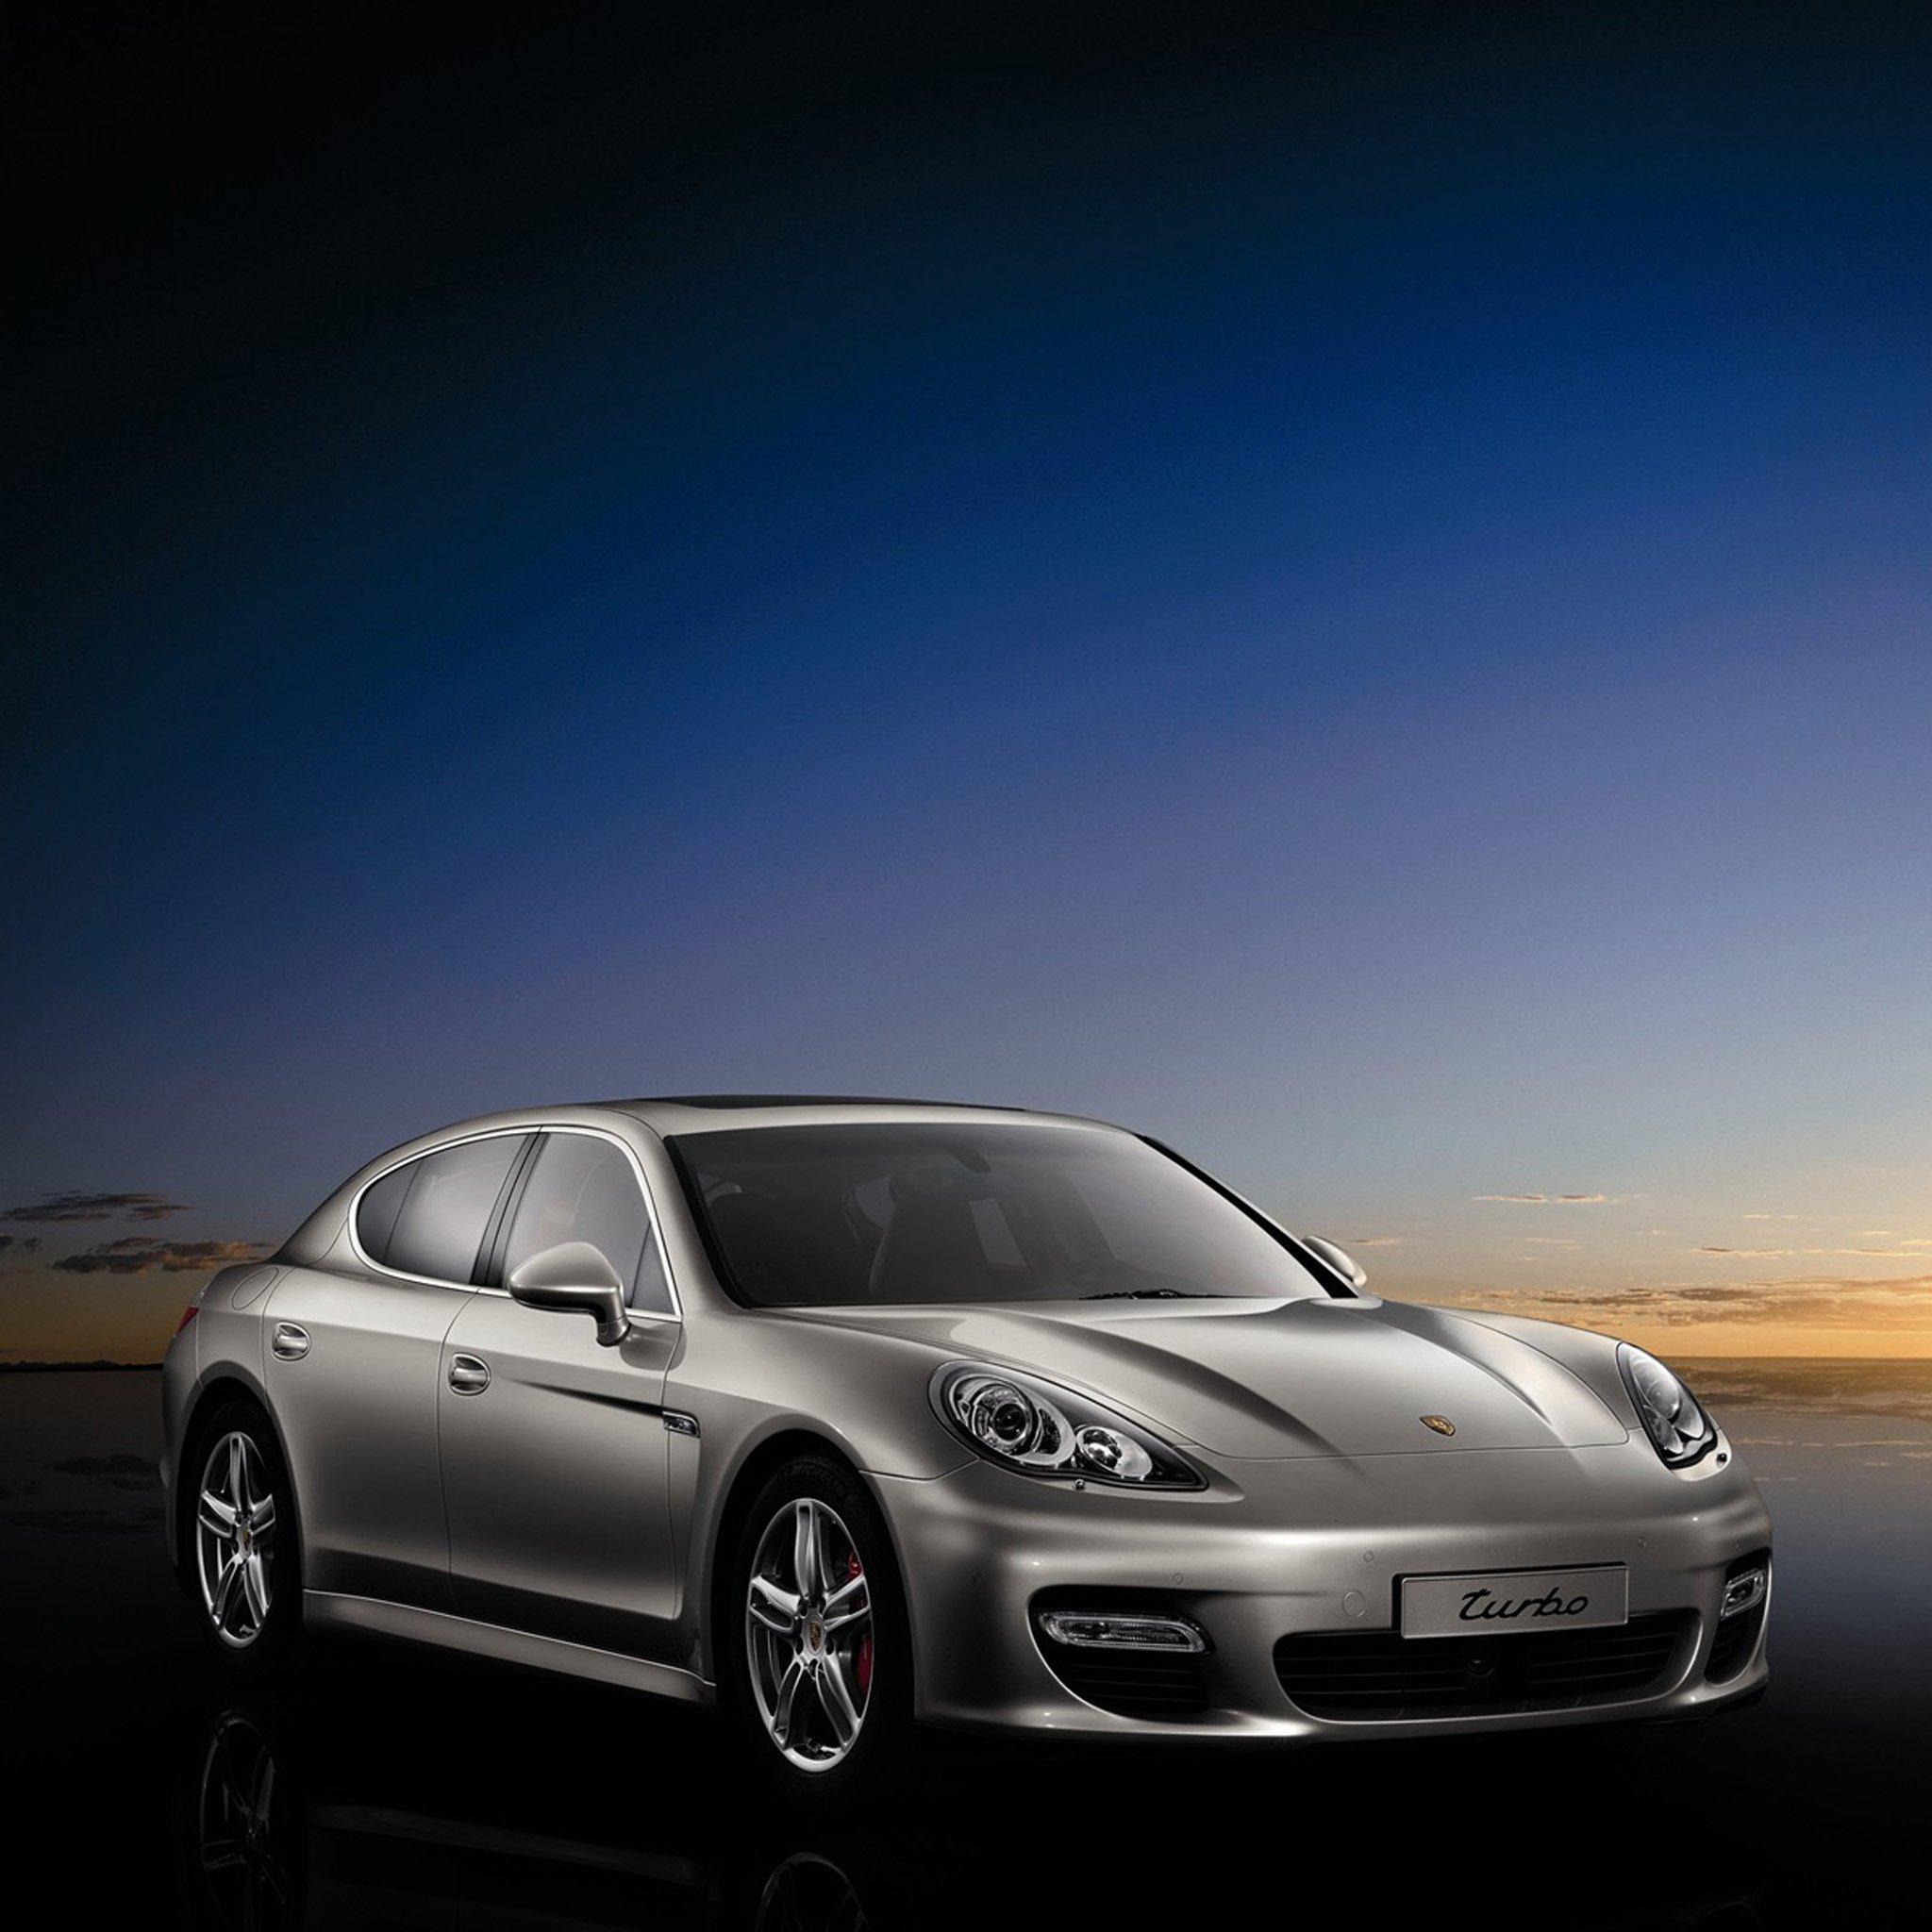 2010 Porsche Panamera 3Wallpapers iPad Retina 2010 Porsche Panamera   iPad Retina